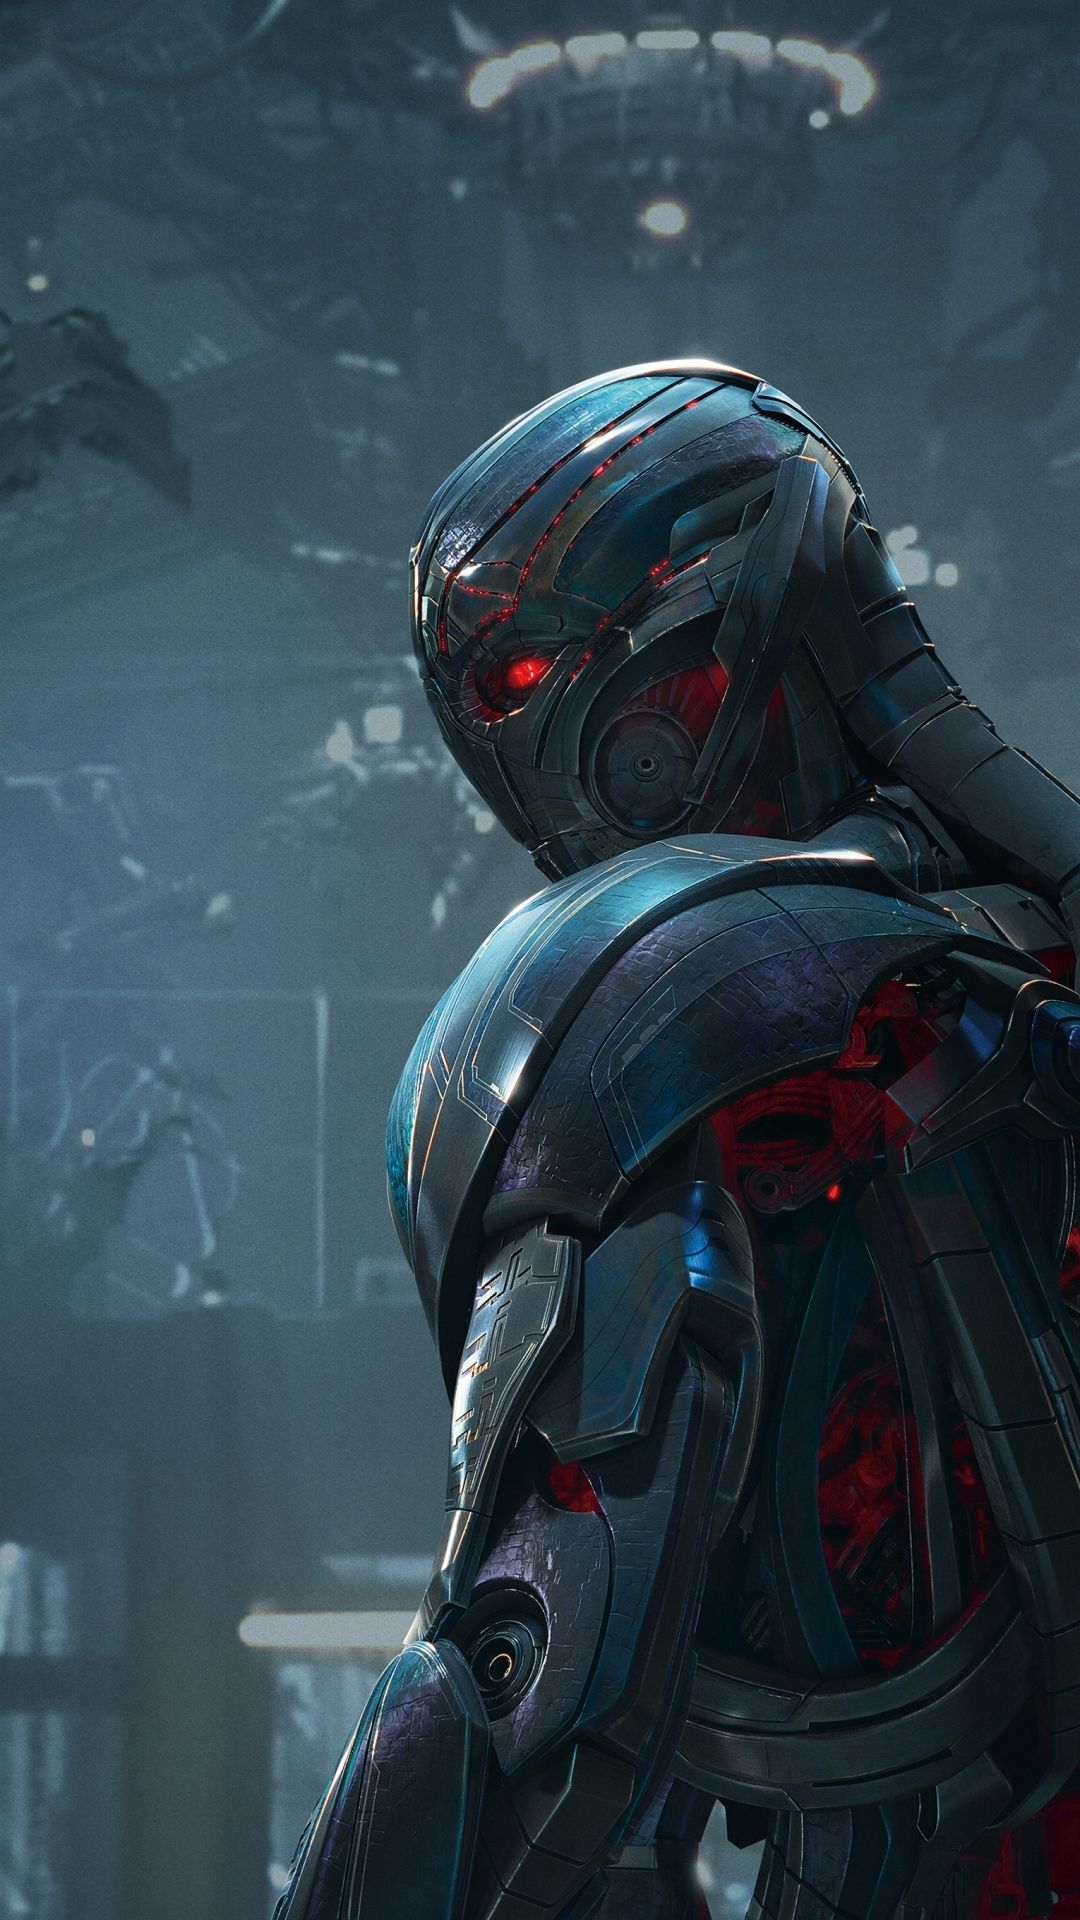 1080x1920 Wallpaper avengers age of ultron, sci-fi, james spader | Wallpapers HD | Pinterest ...